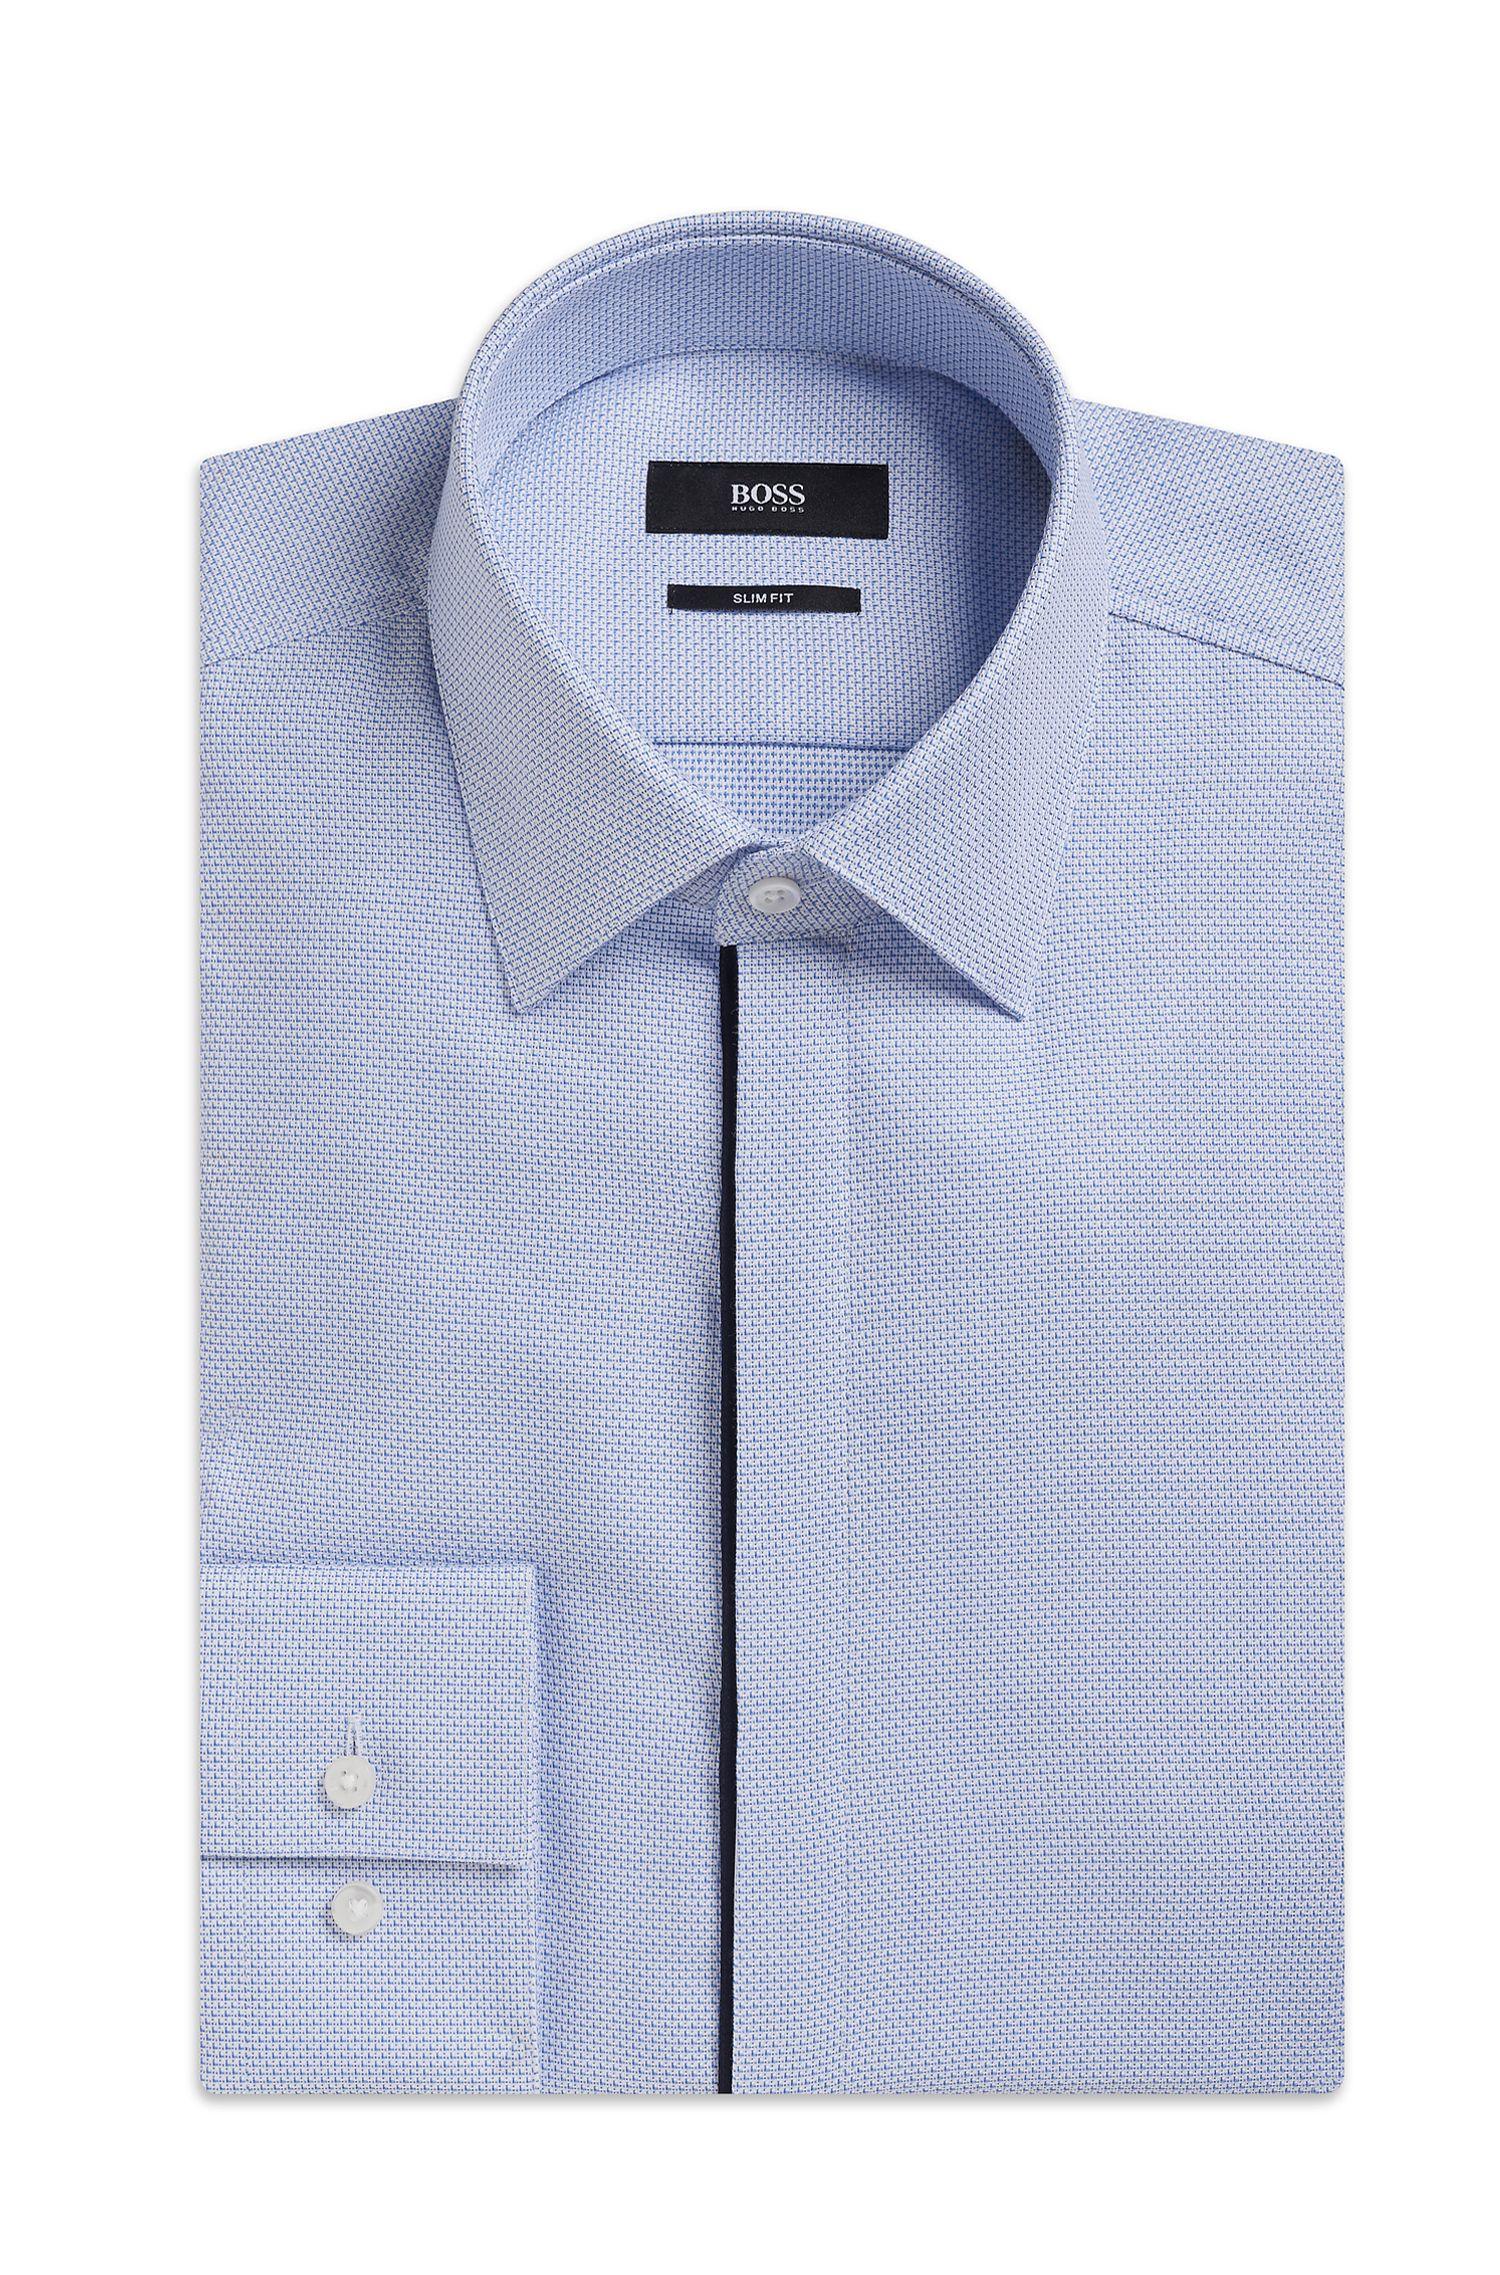 'Jamis'   Slim Fit, Cotton Patterned Dress Shirt